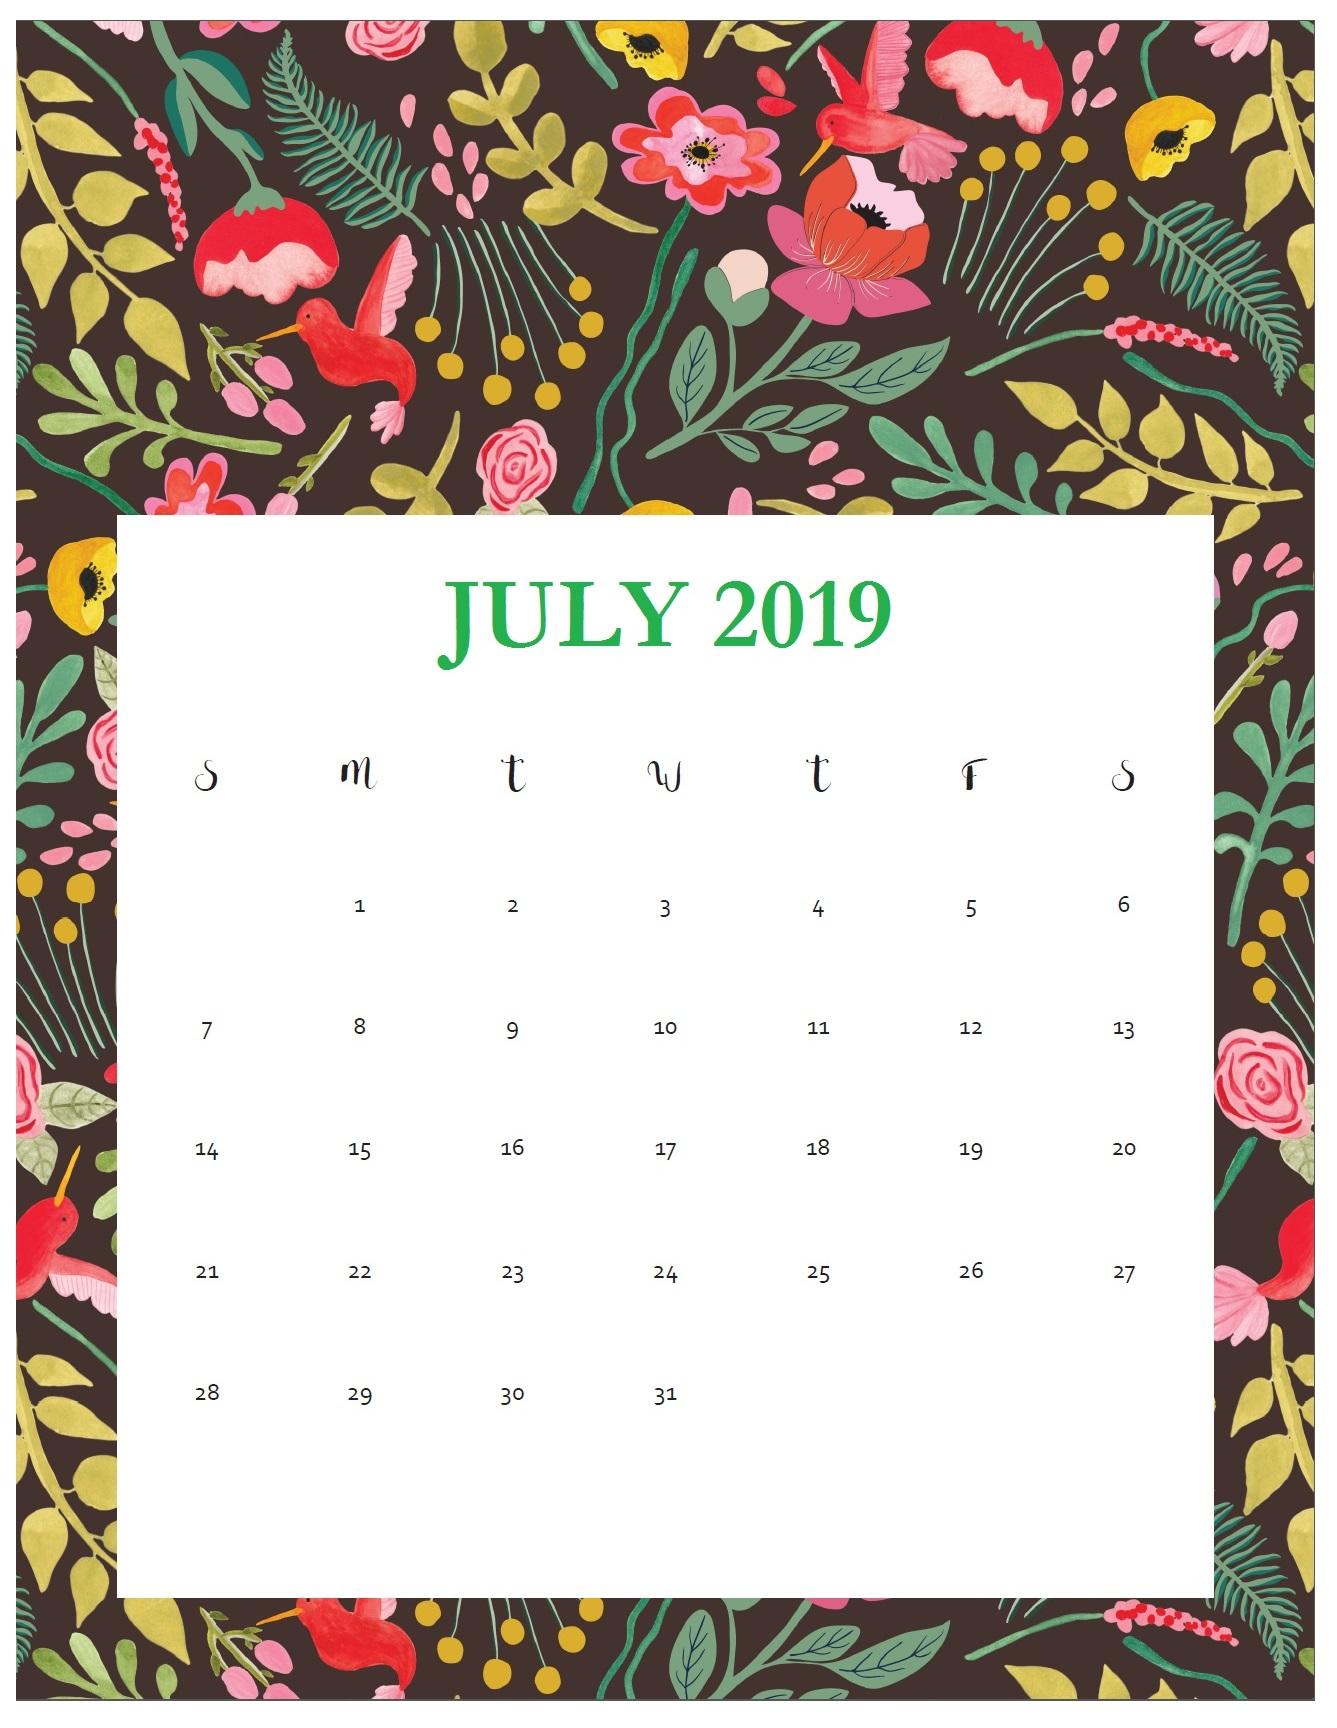 Print Beautiful July 2019 Calendar Template